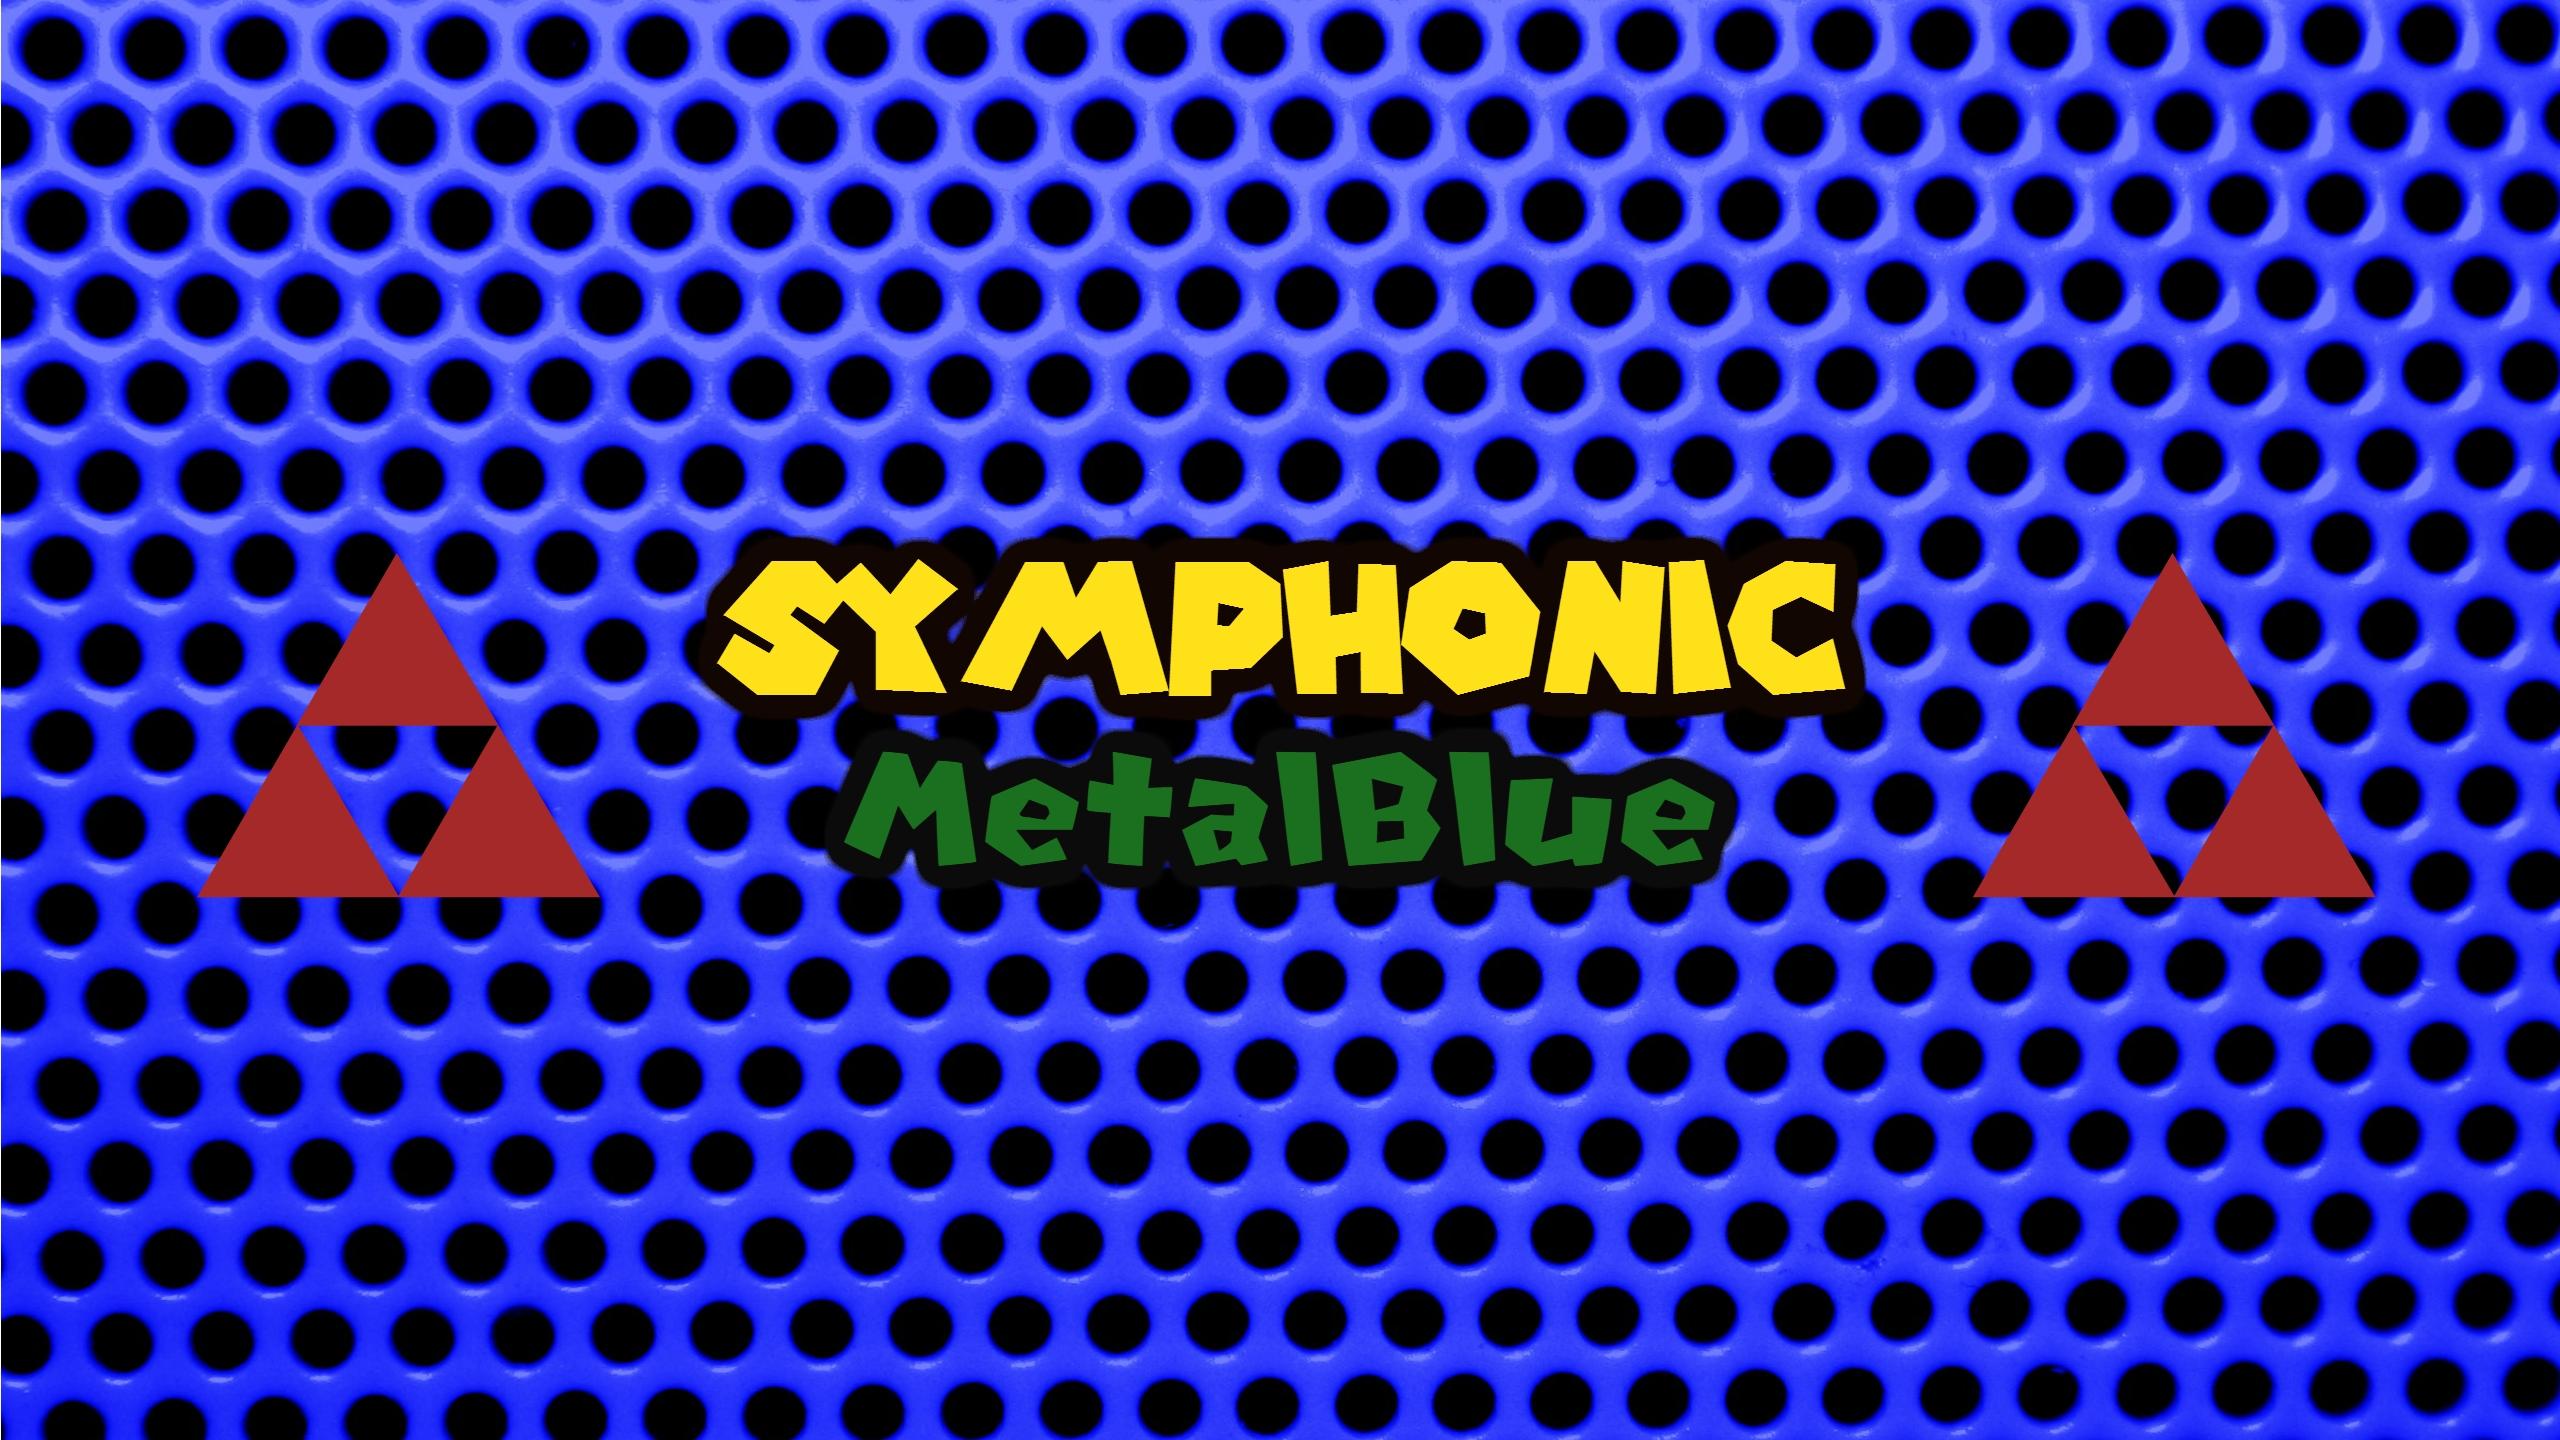 Symphonic MetalBlue